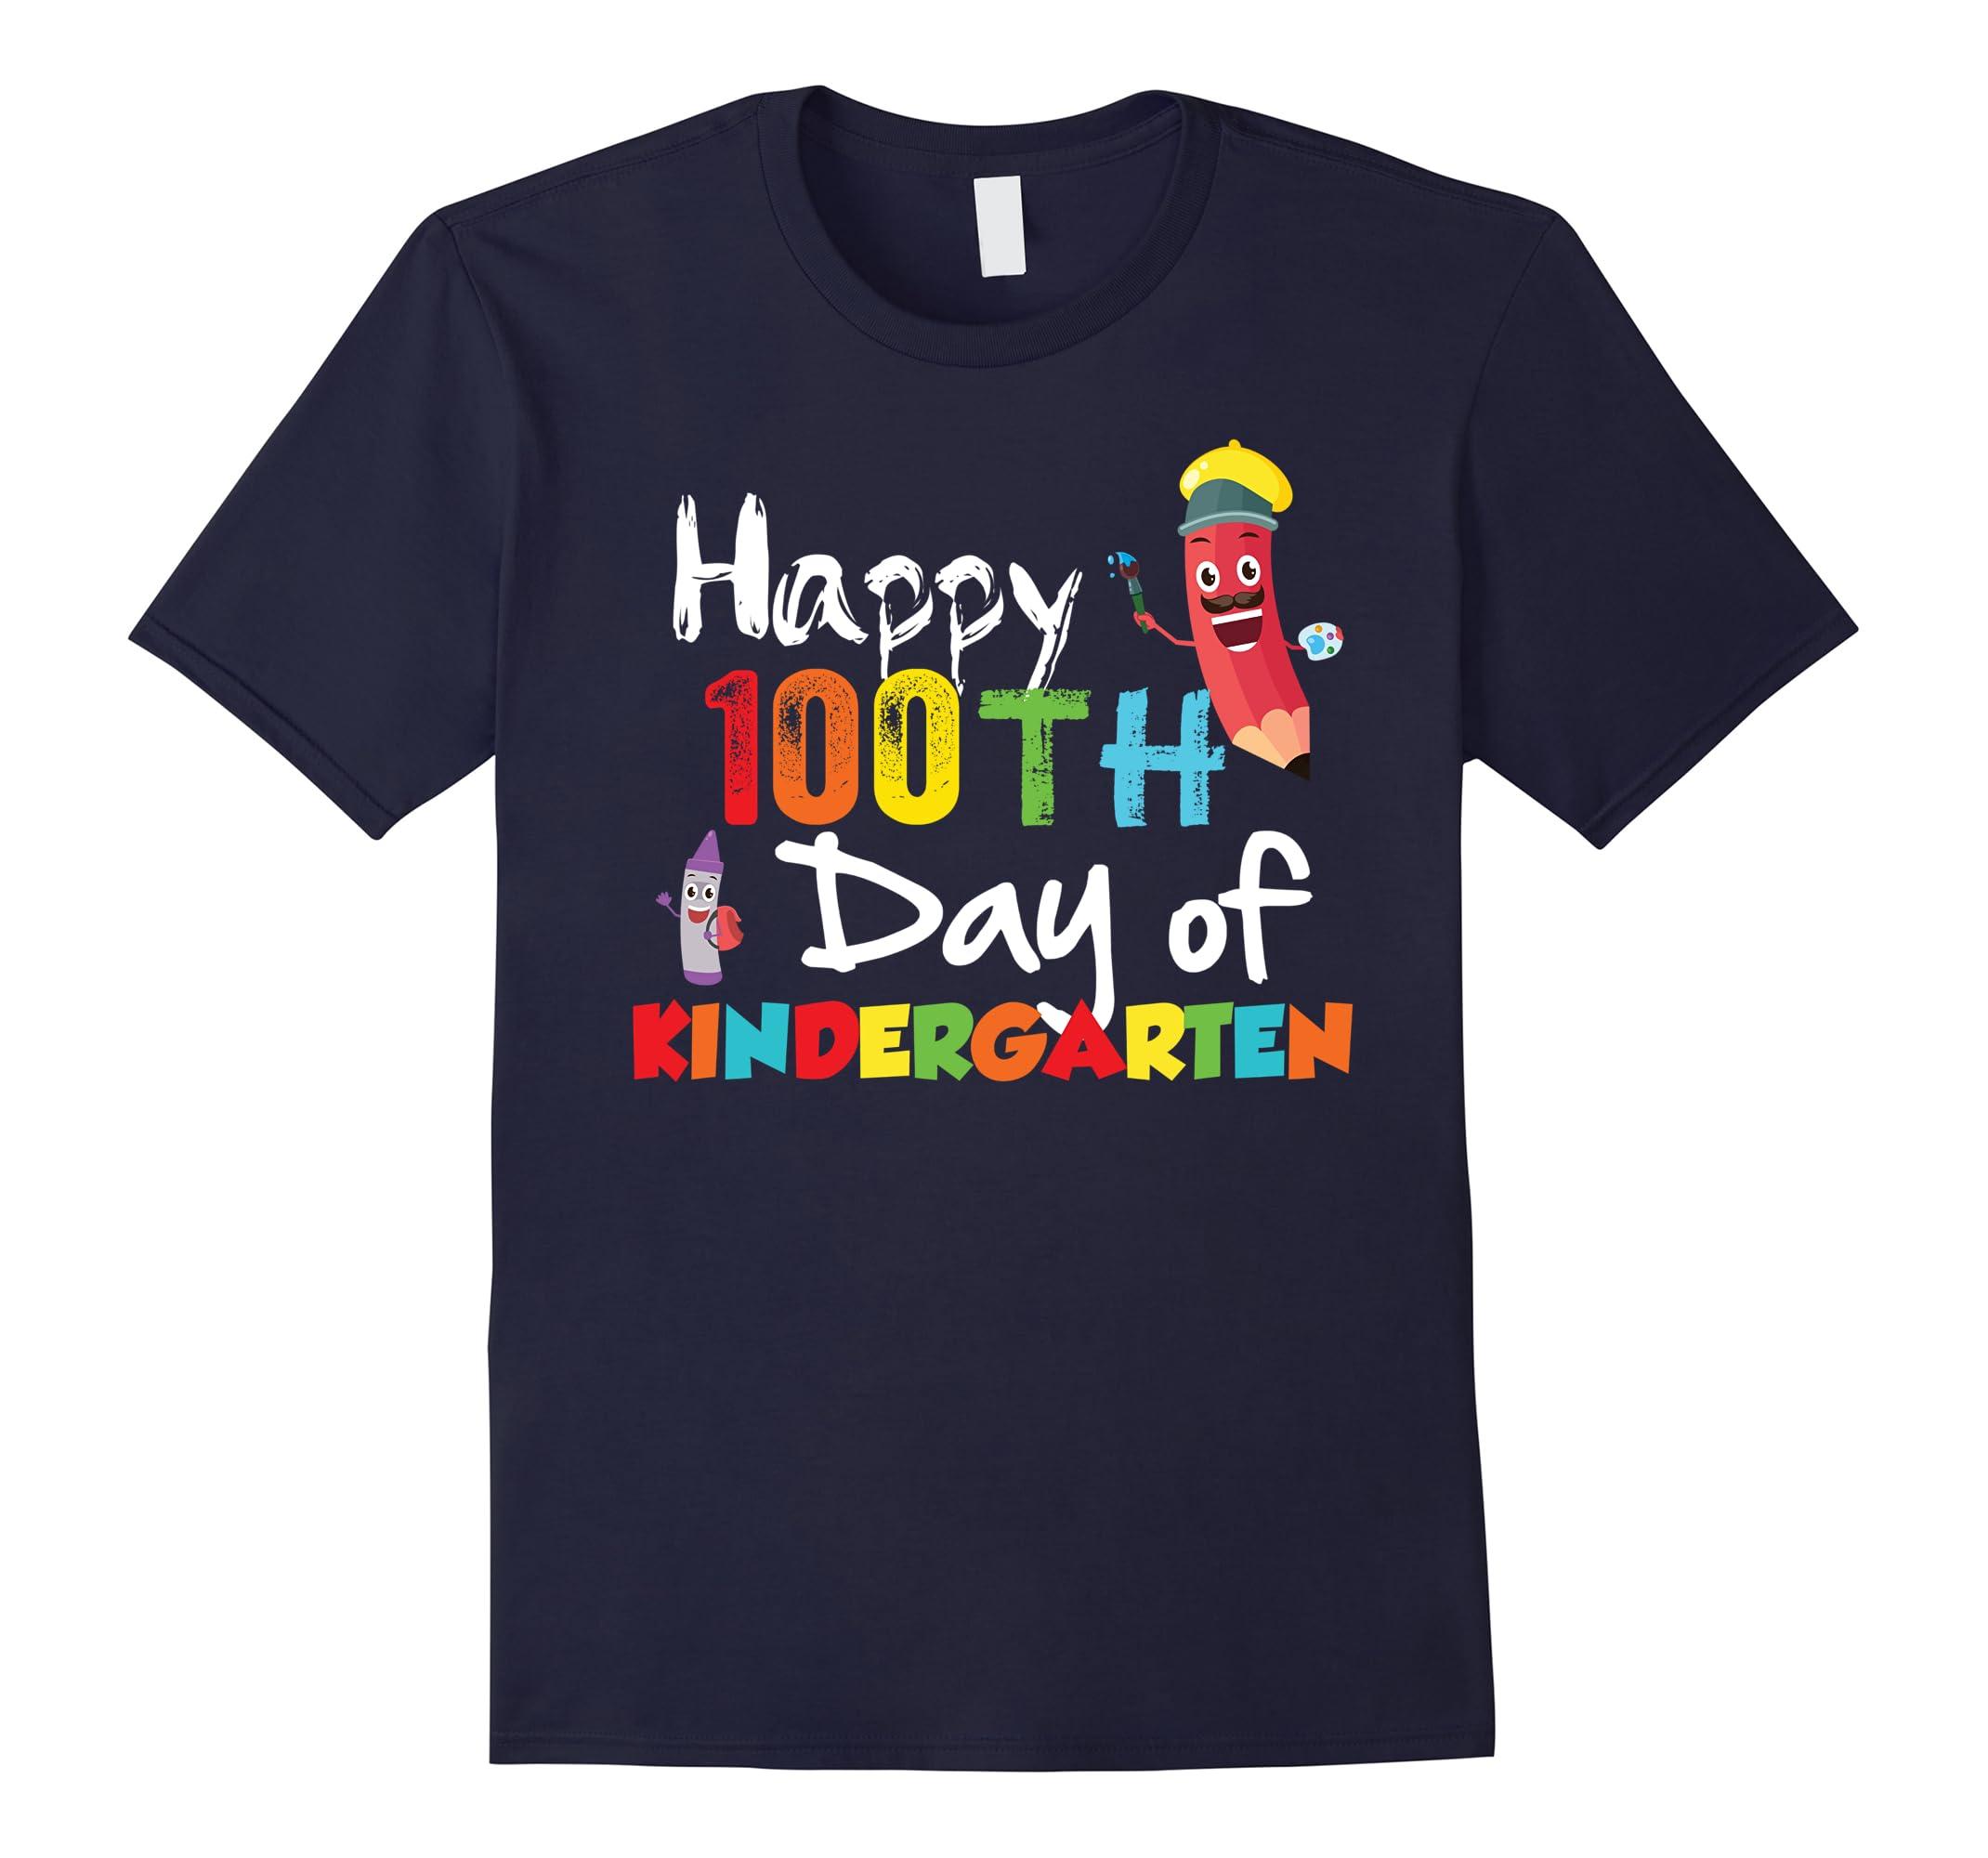 Adorable Happy 100th Day of Kindergarten Teacher Shirt-ah my shirt one gift